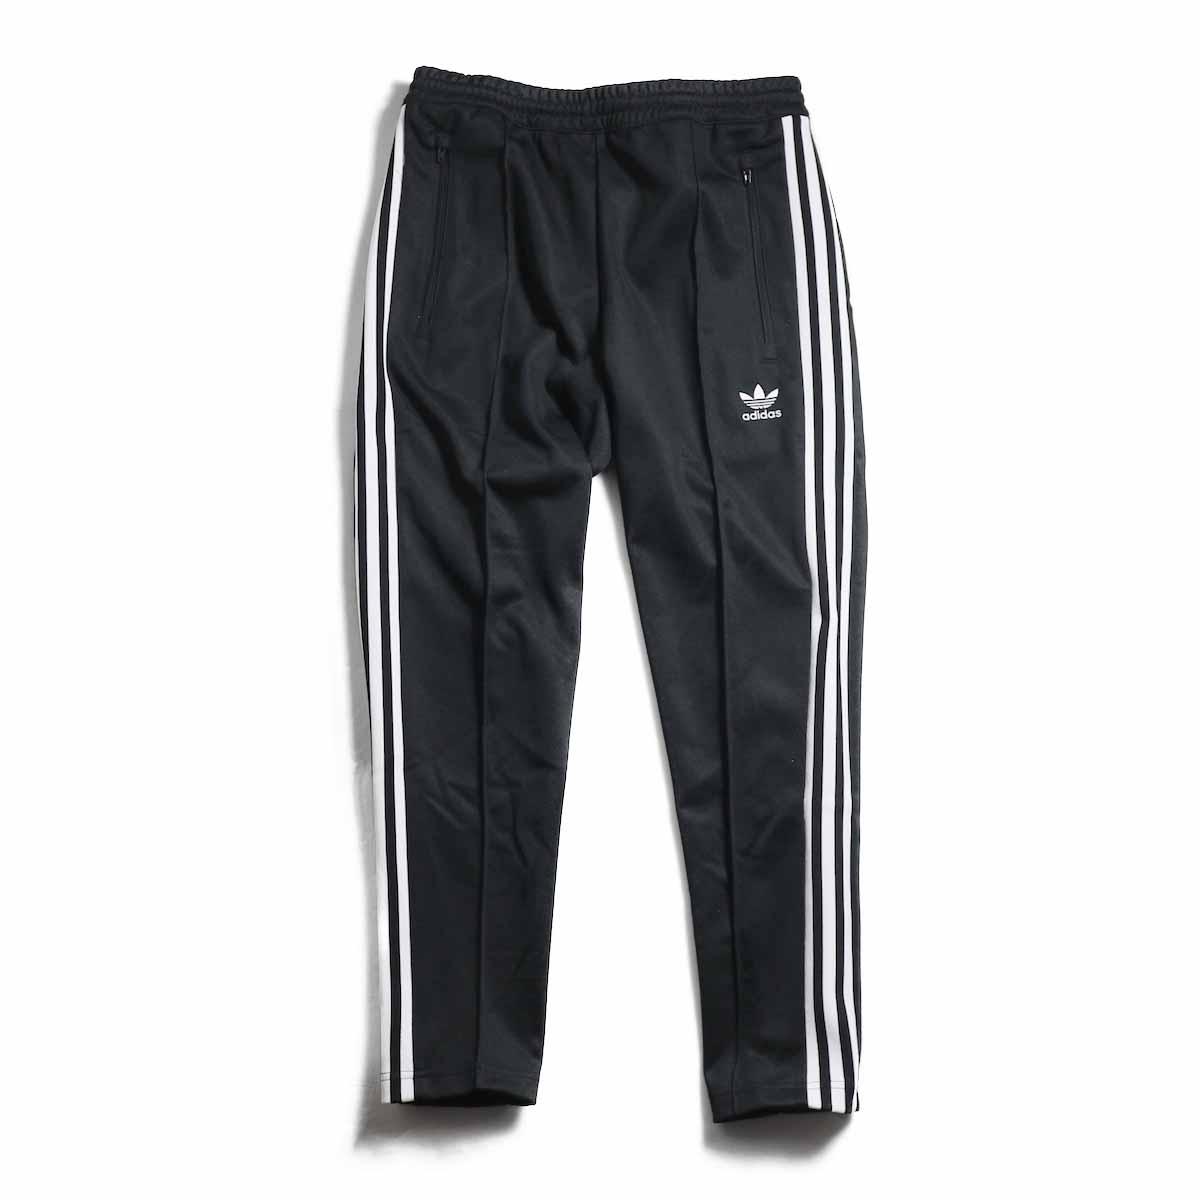 adidas originals / Beckenbauer Track Pants -Black